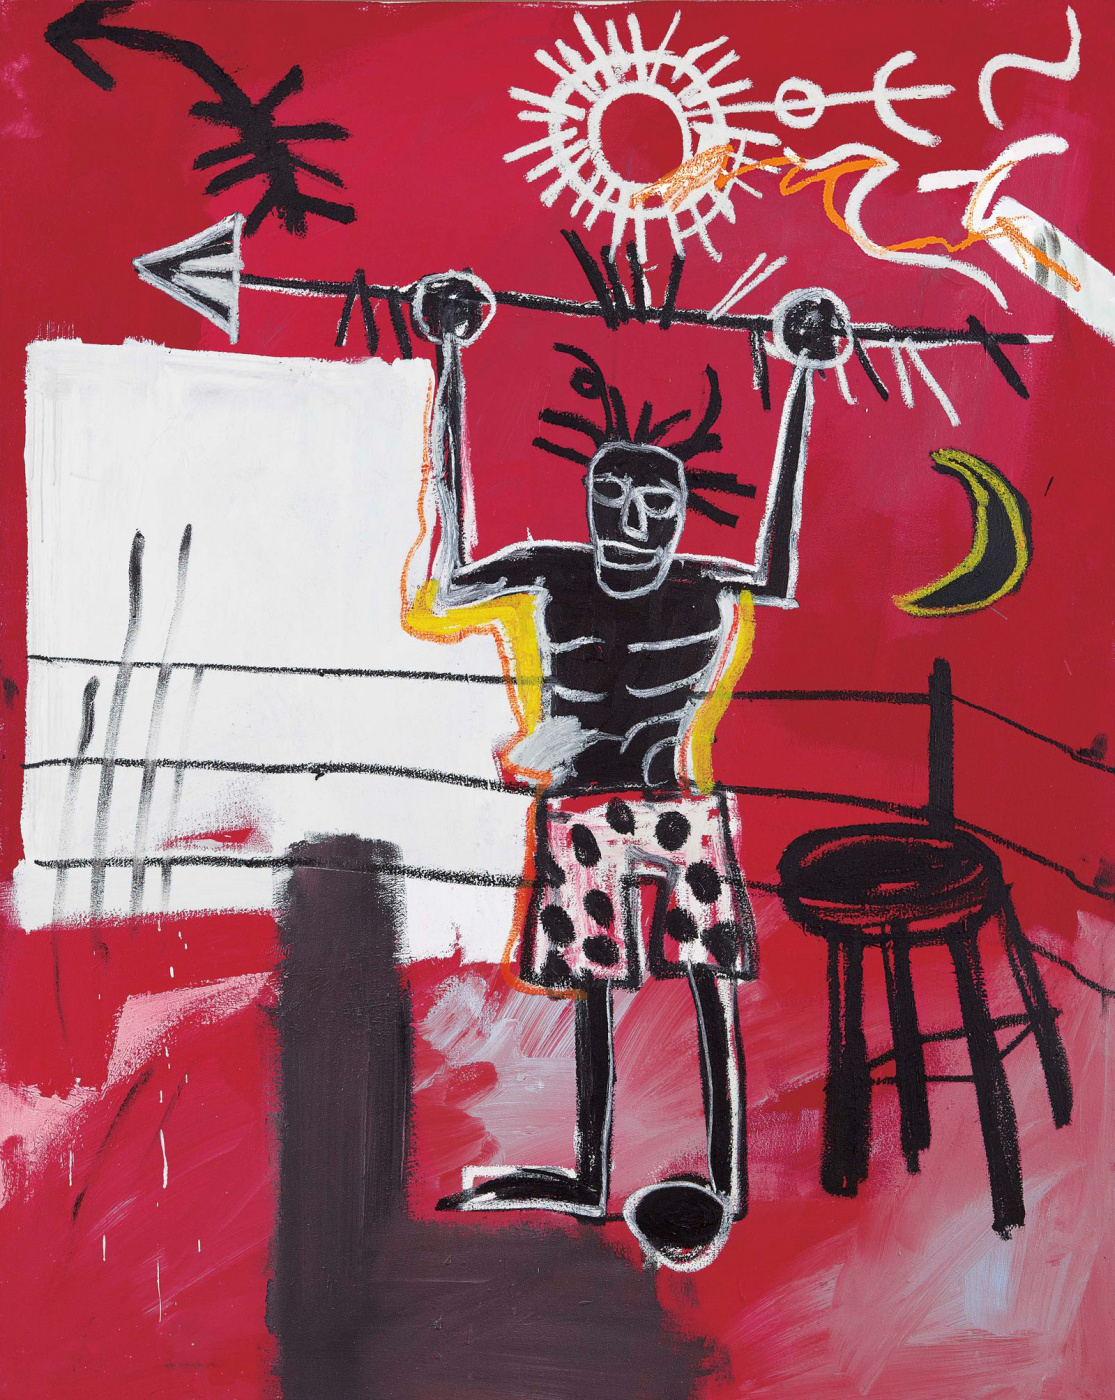 Jean-Michel Basquiat. The ring